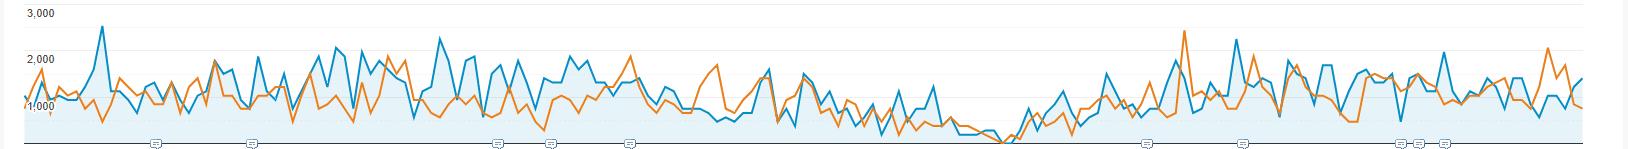 Google Analytics graph for eCommerce SEO case study